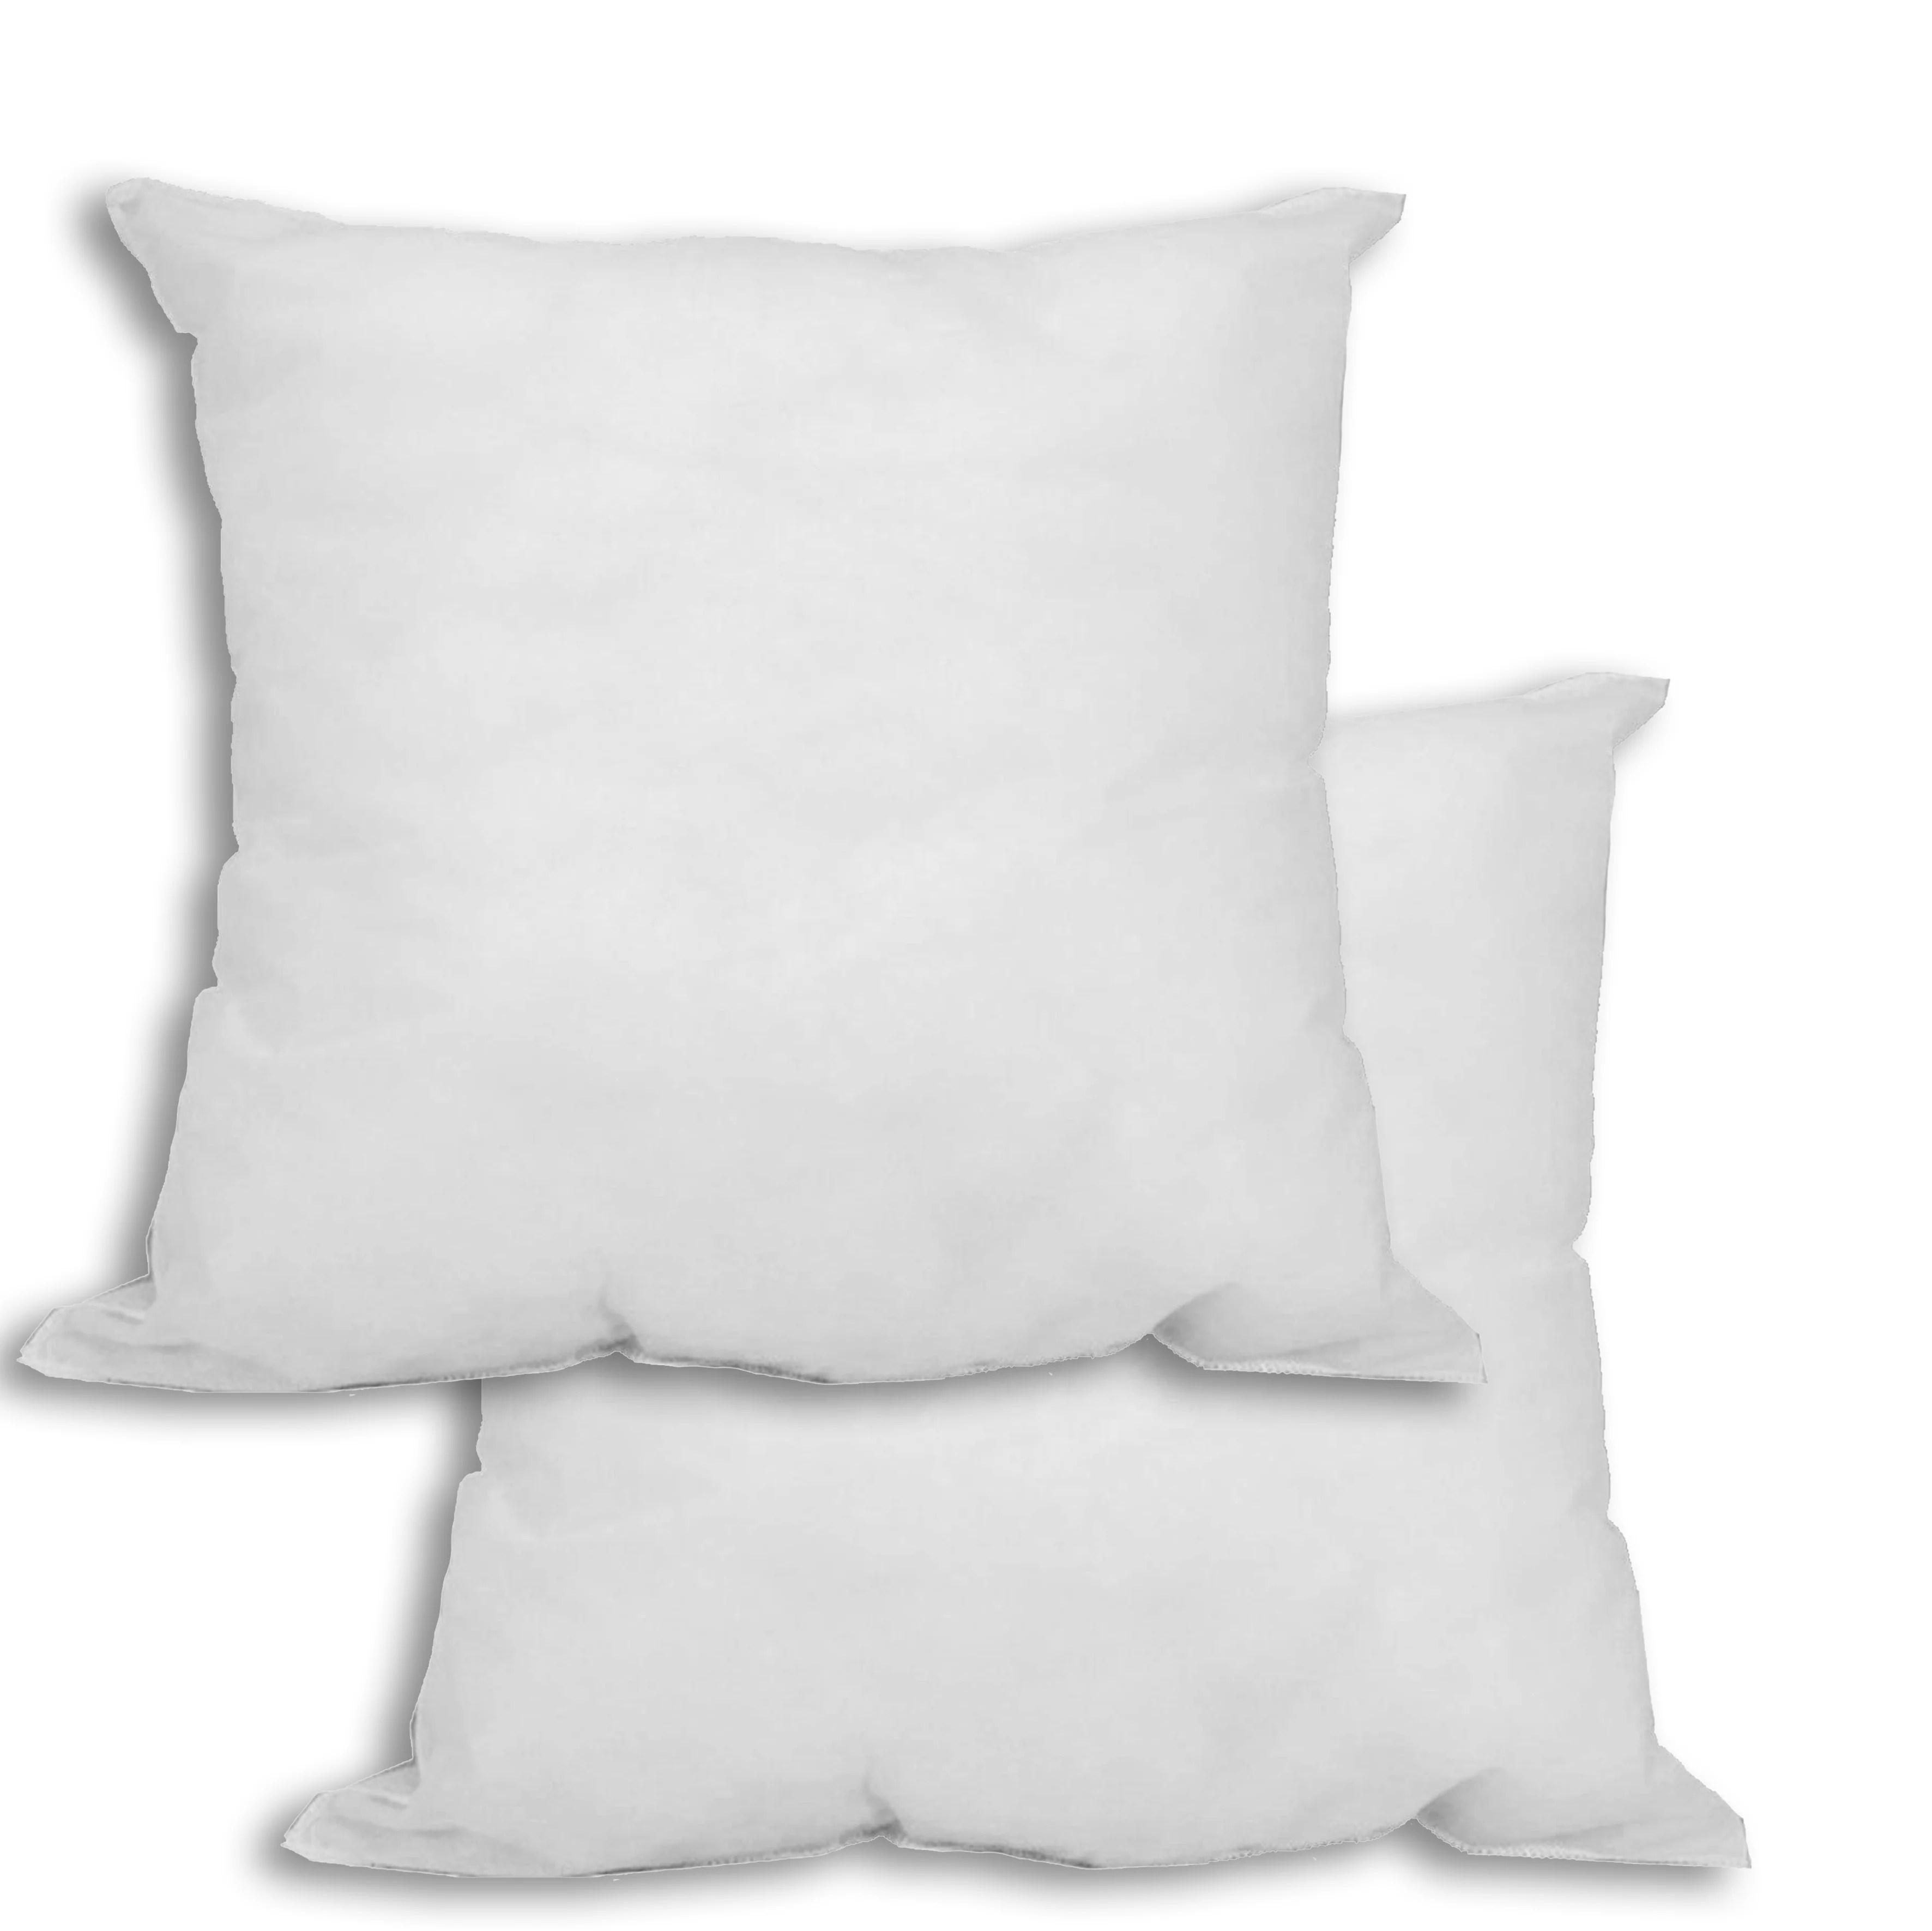 set of 2 20 x 20 premium hypoallergenic stuffer pillow insert square white walmart com